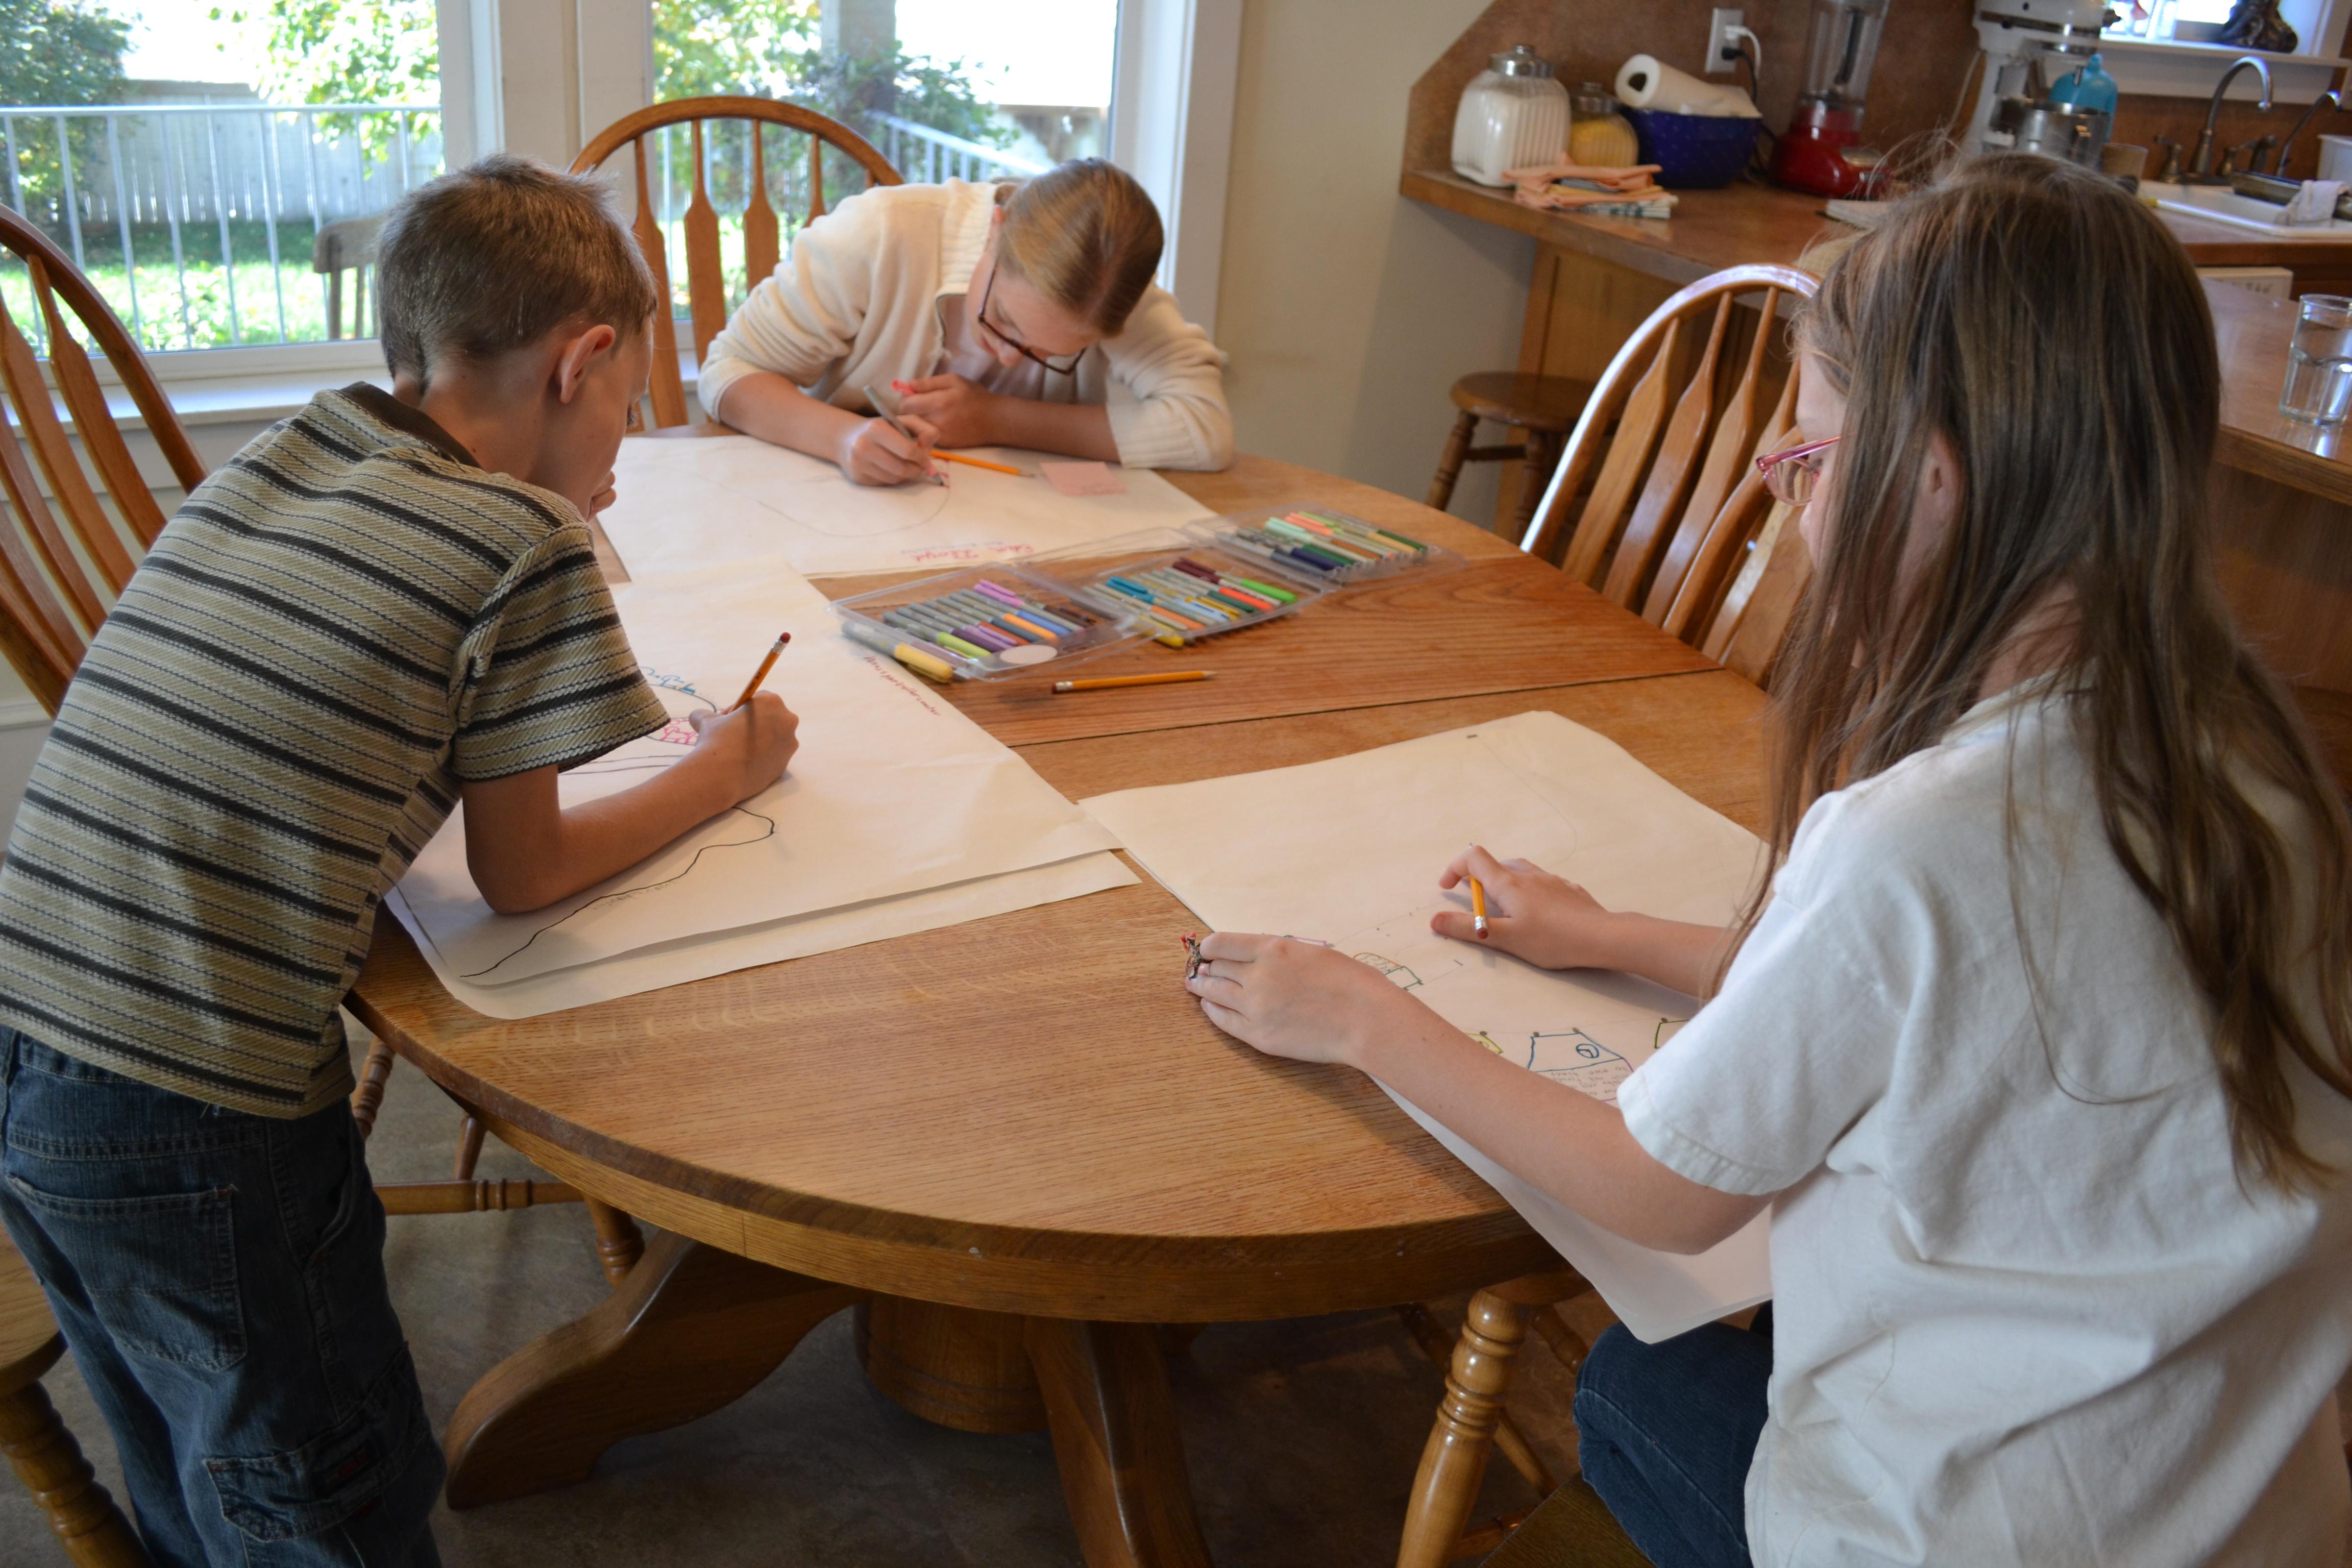 Plot Roller Coasters Kids Prepare To Write Fiction